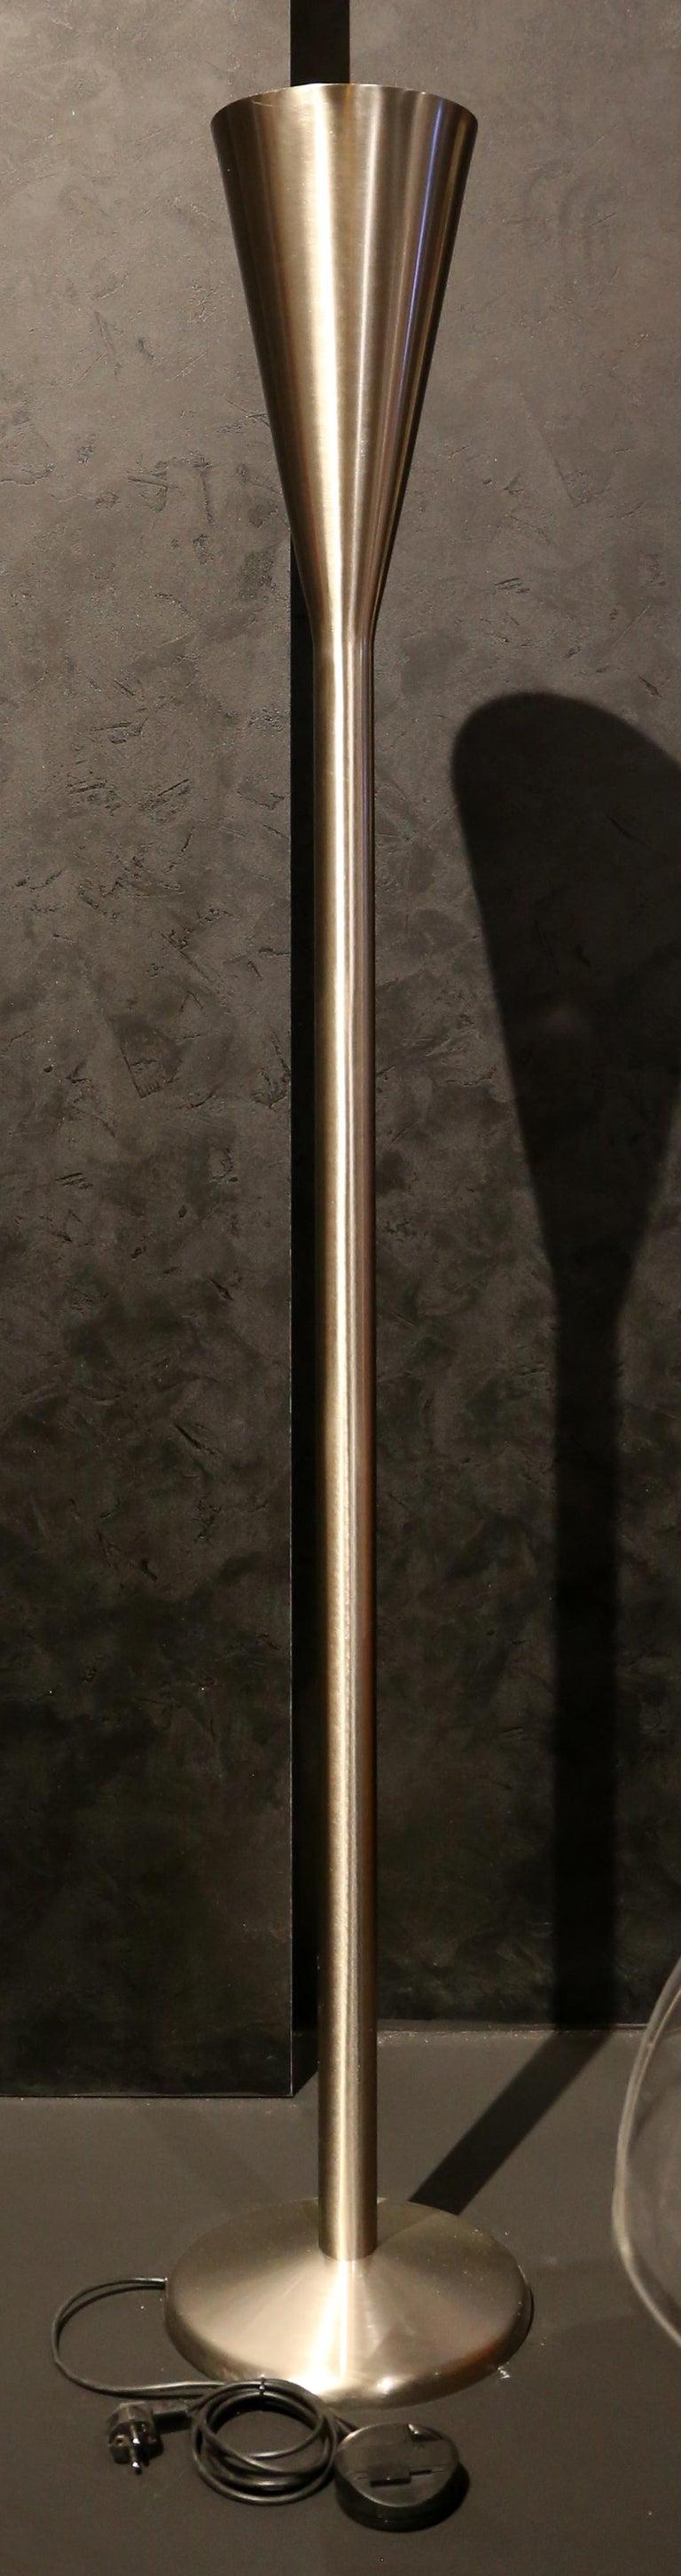 Modern FontanaArte Luminator Floor Lamp by Pietro Chiesa 1933 Nickel-plated Brass MCM For Sale